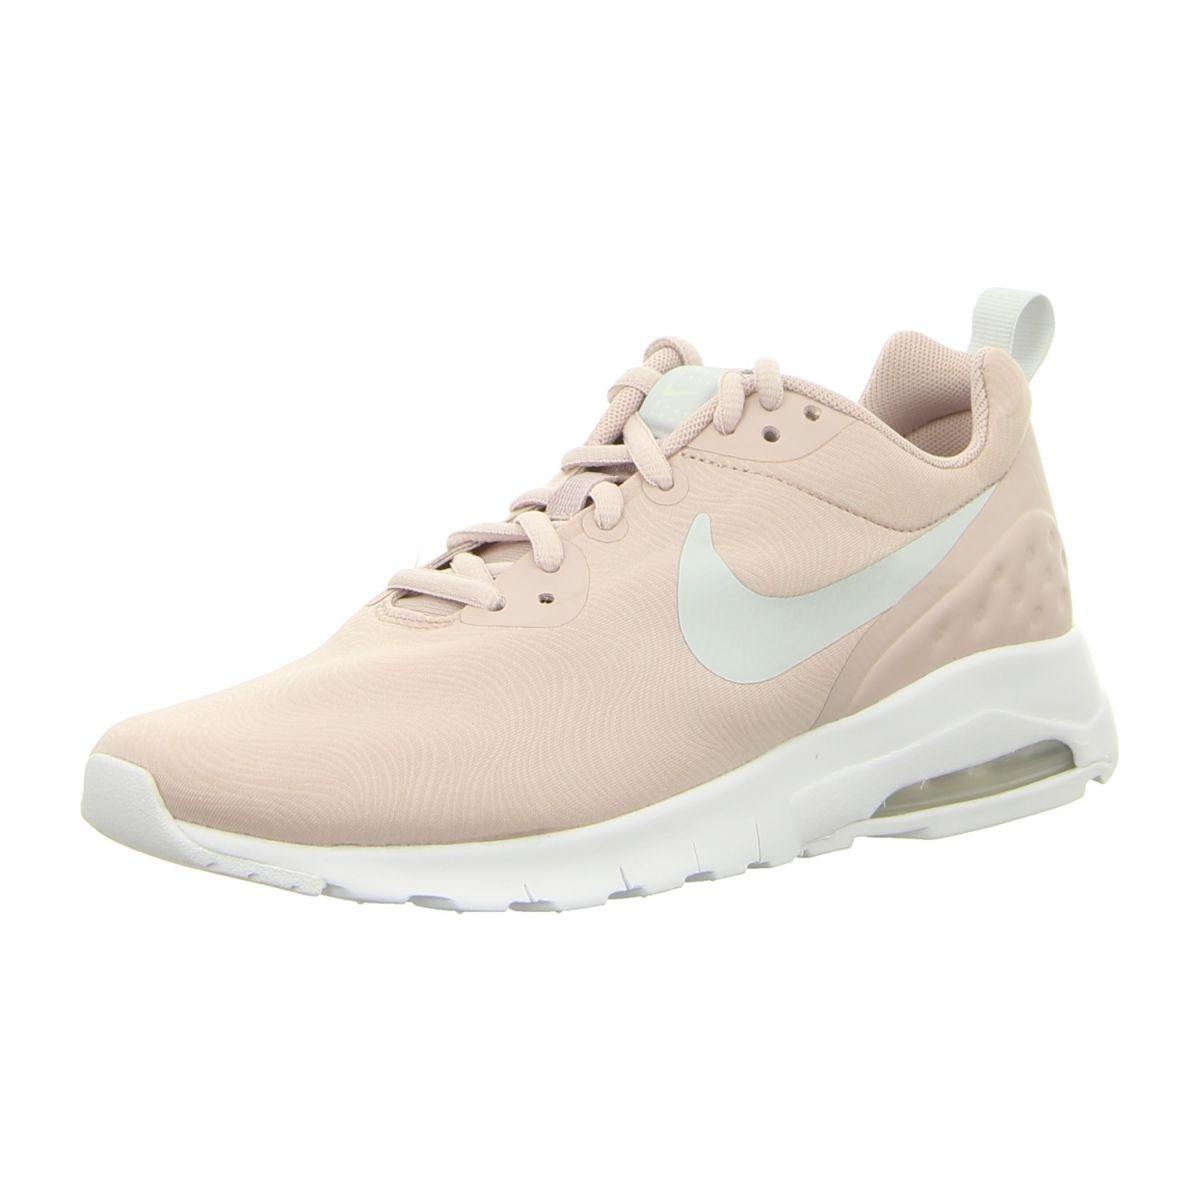 NEU: Nike Sneaker WMNSAirMaxMotion 844895 604 particle